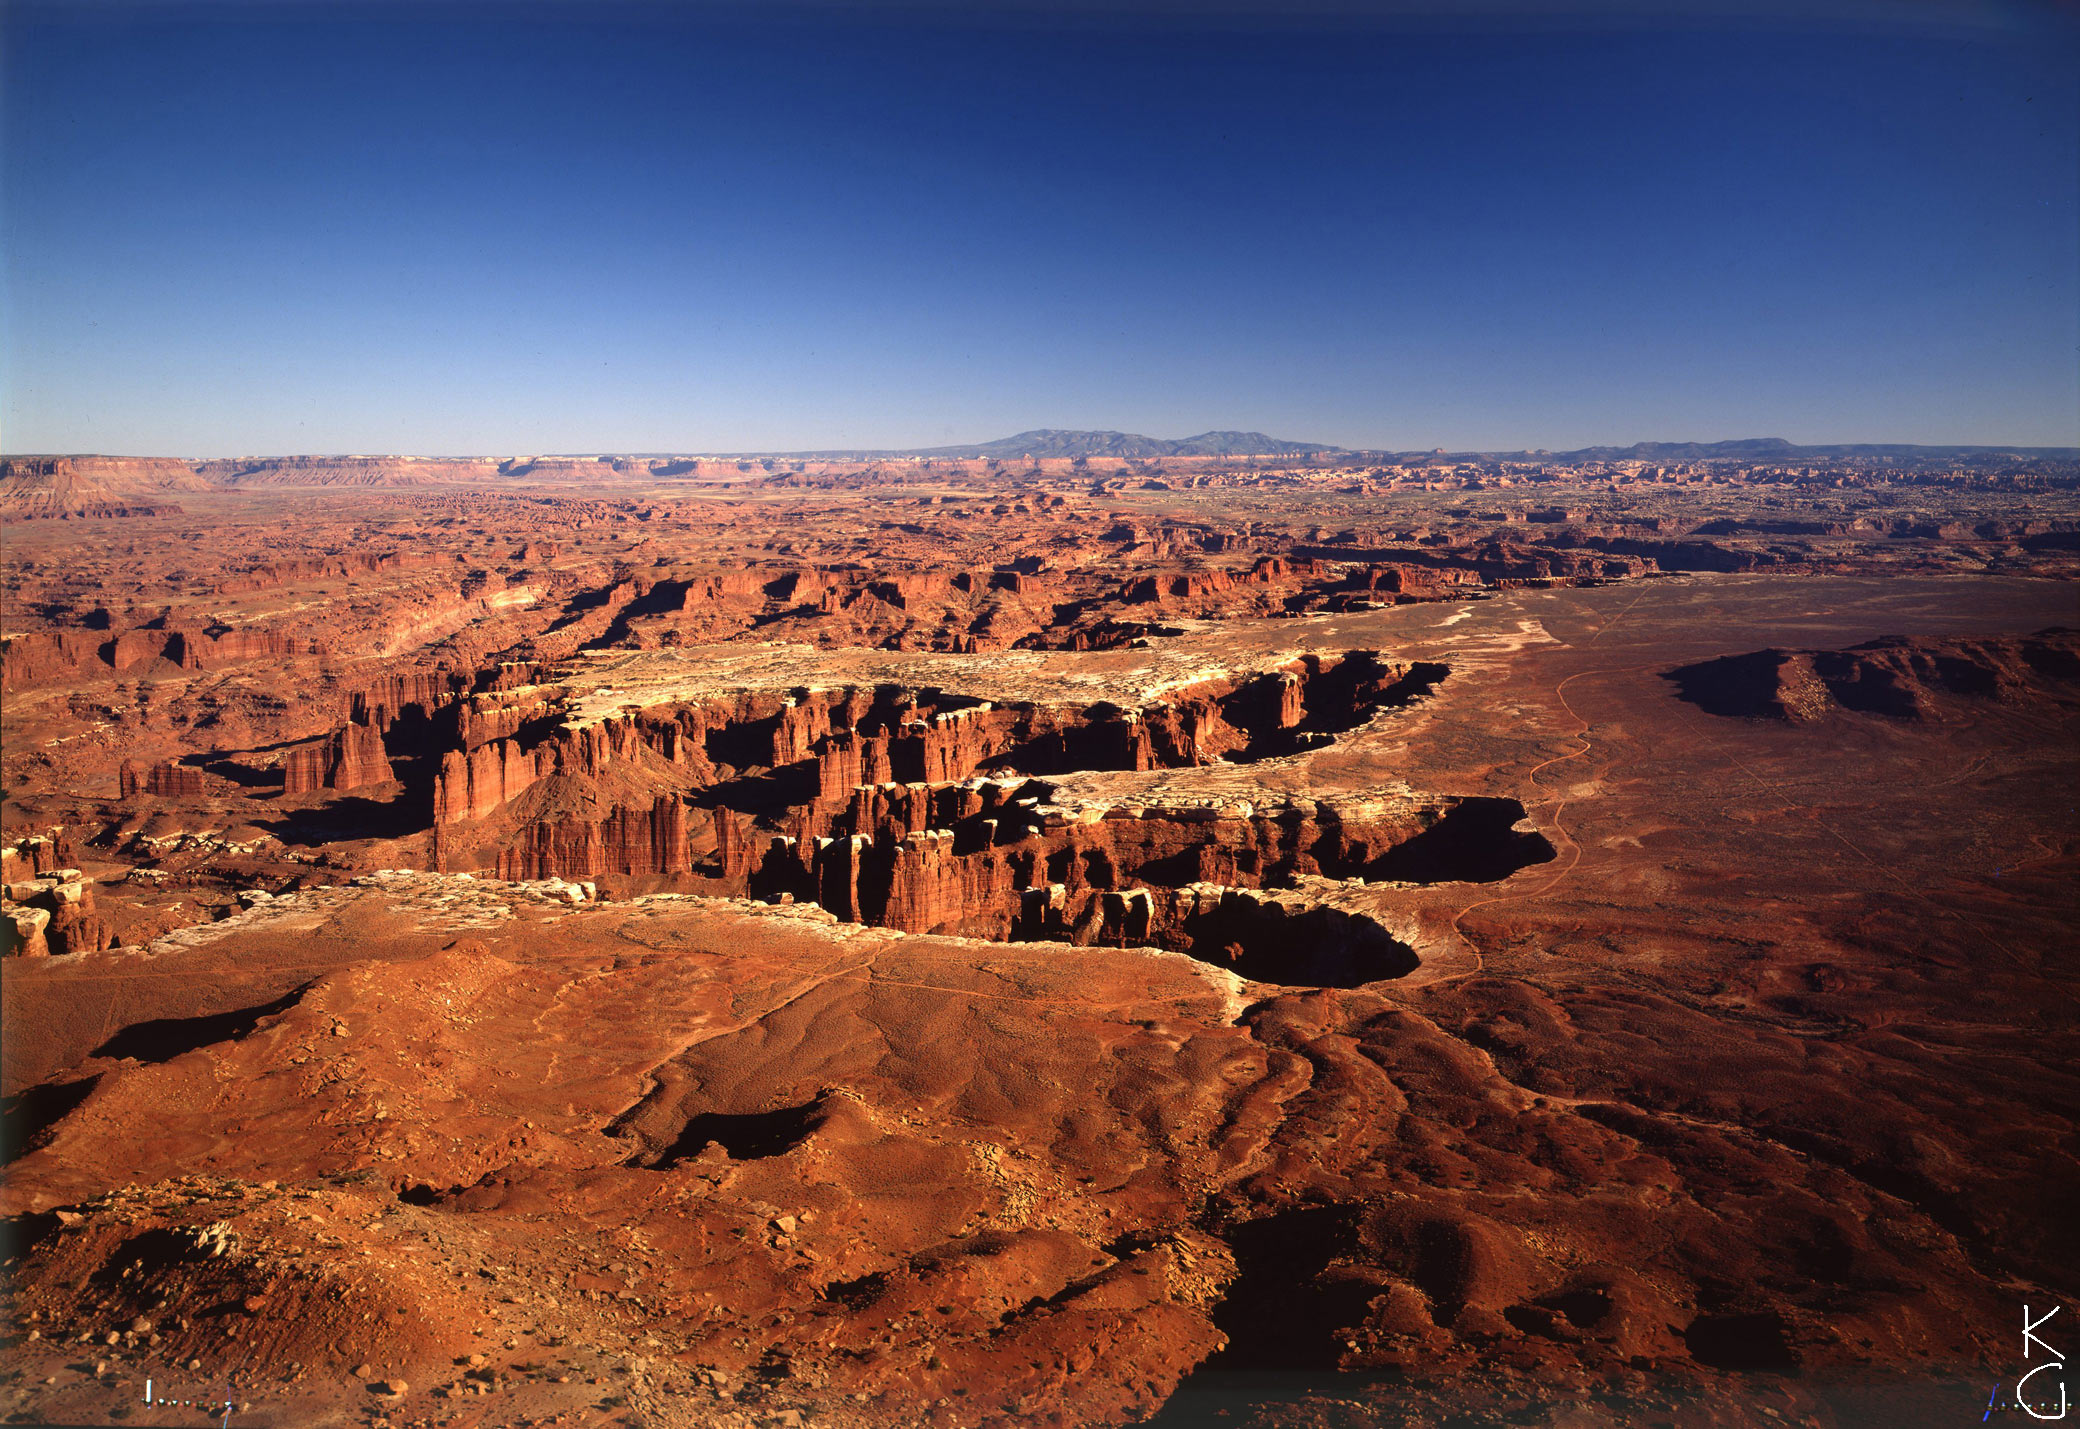 Dinosaur's Footprint, near Moab